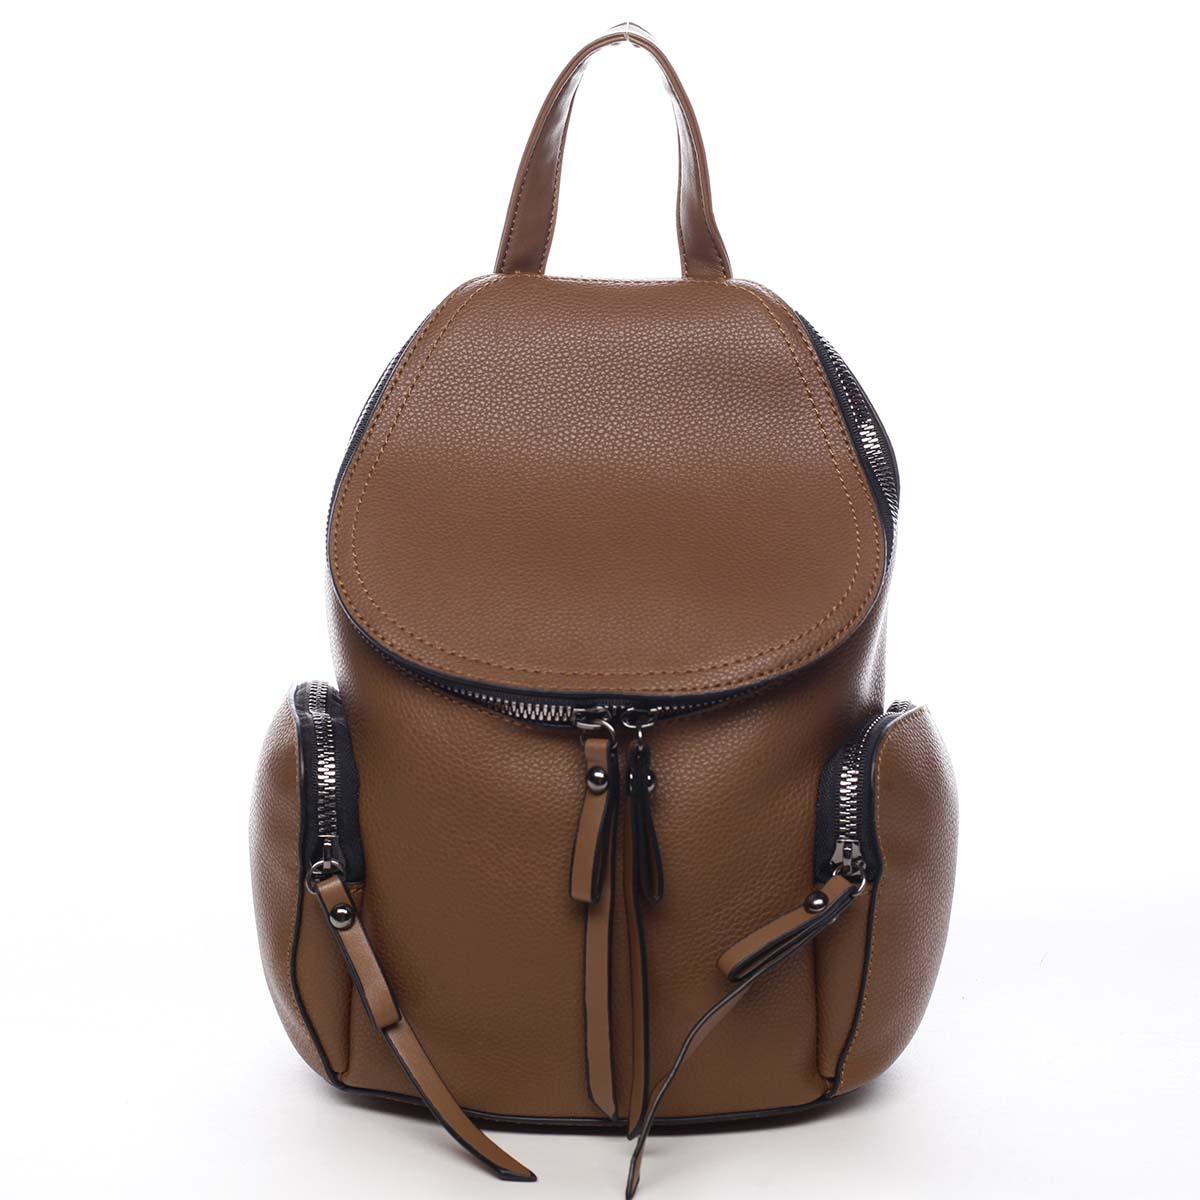 Dámsky batoh hnedý - Maria C Hips Small